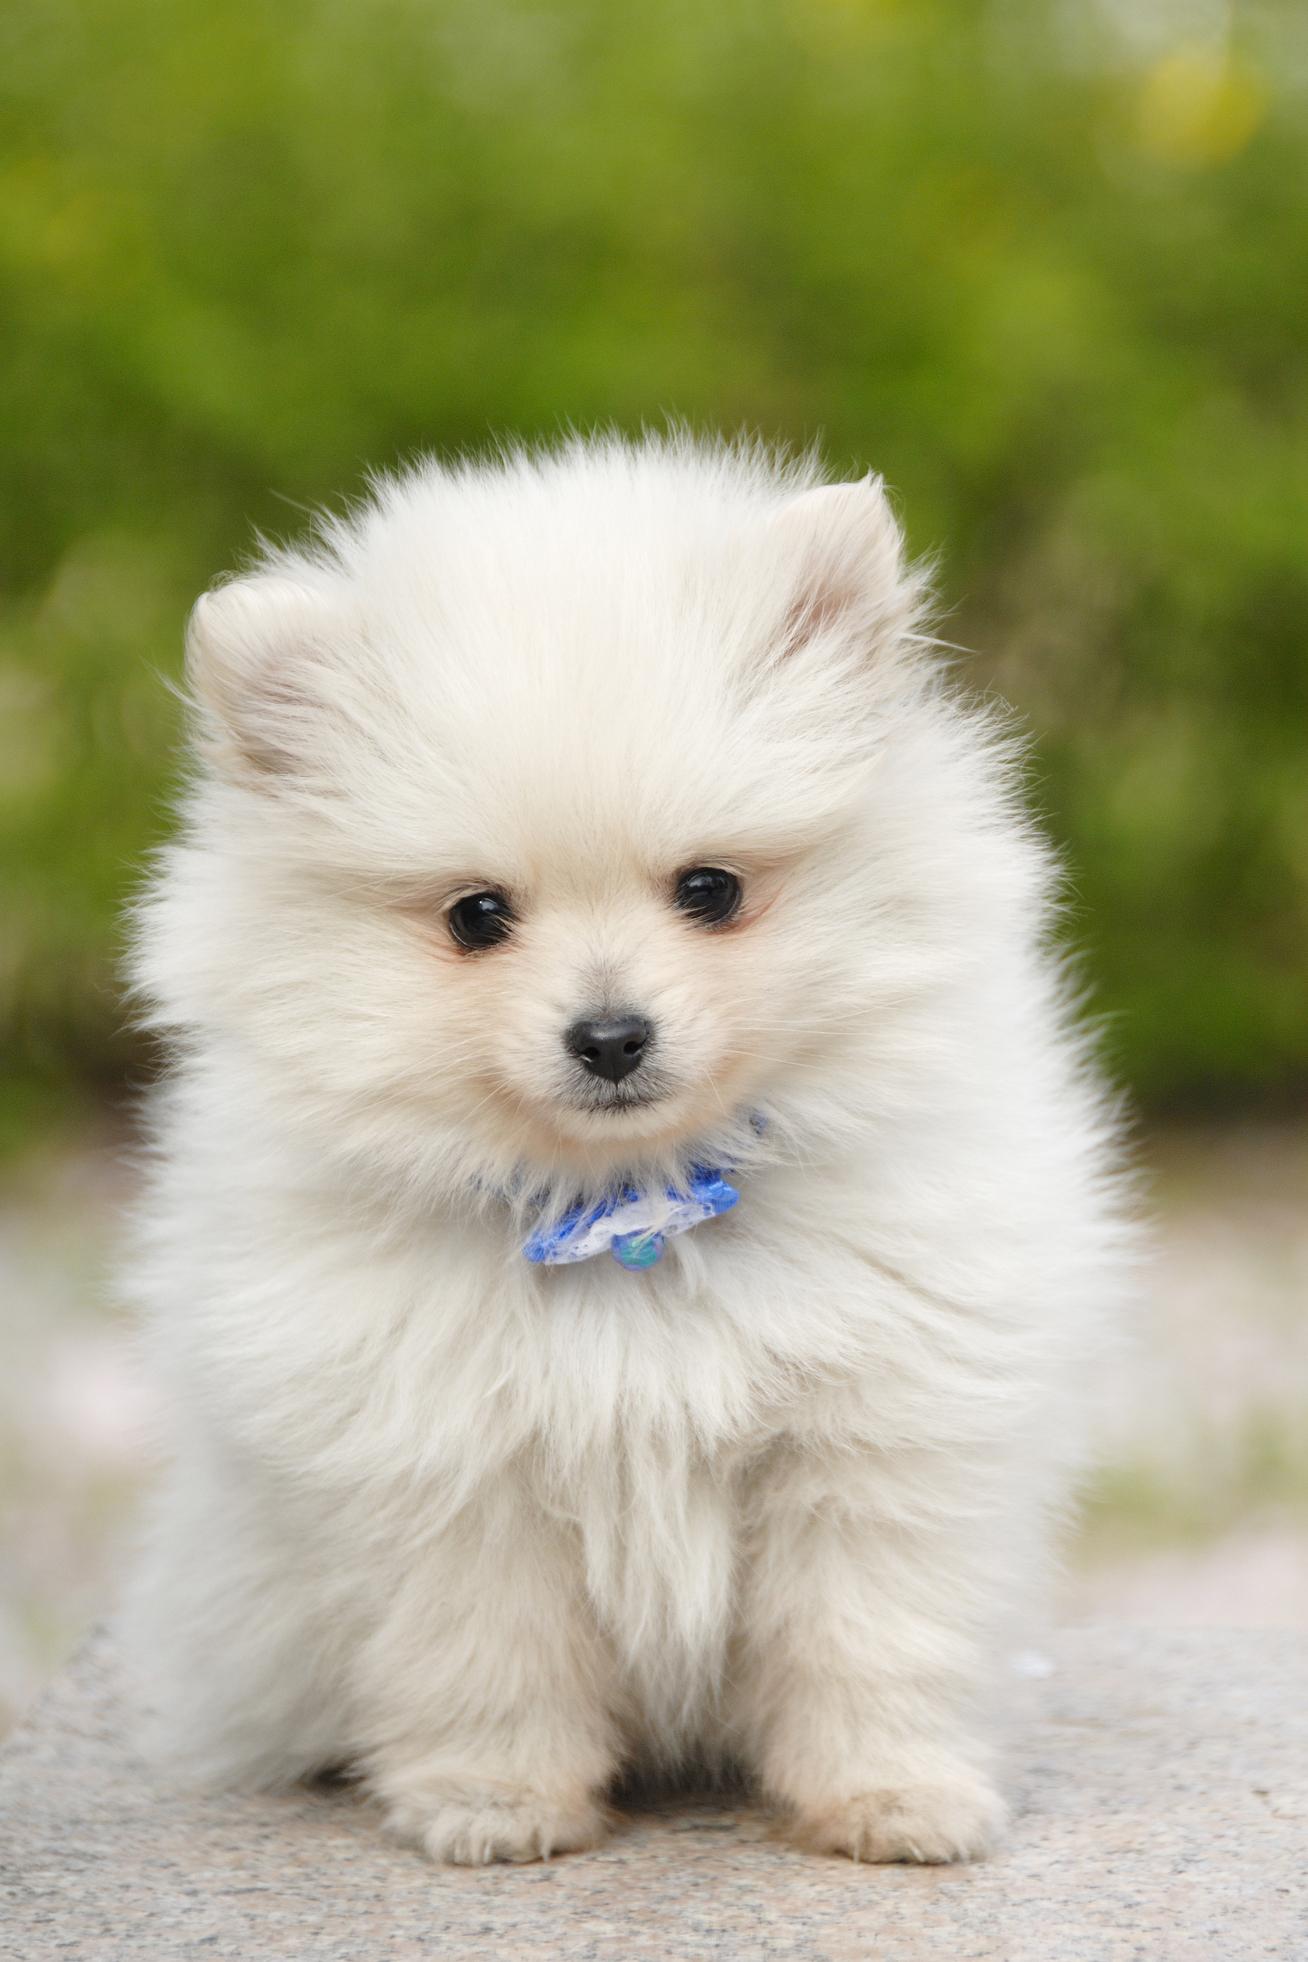 Very Small Dog Bite